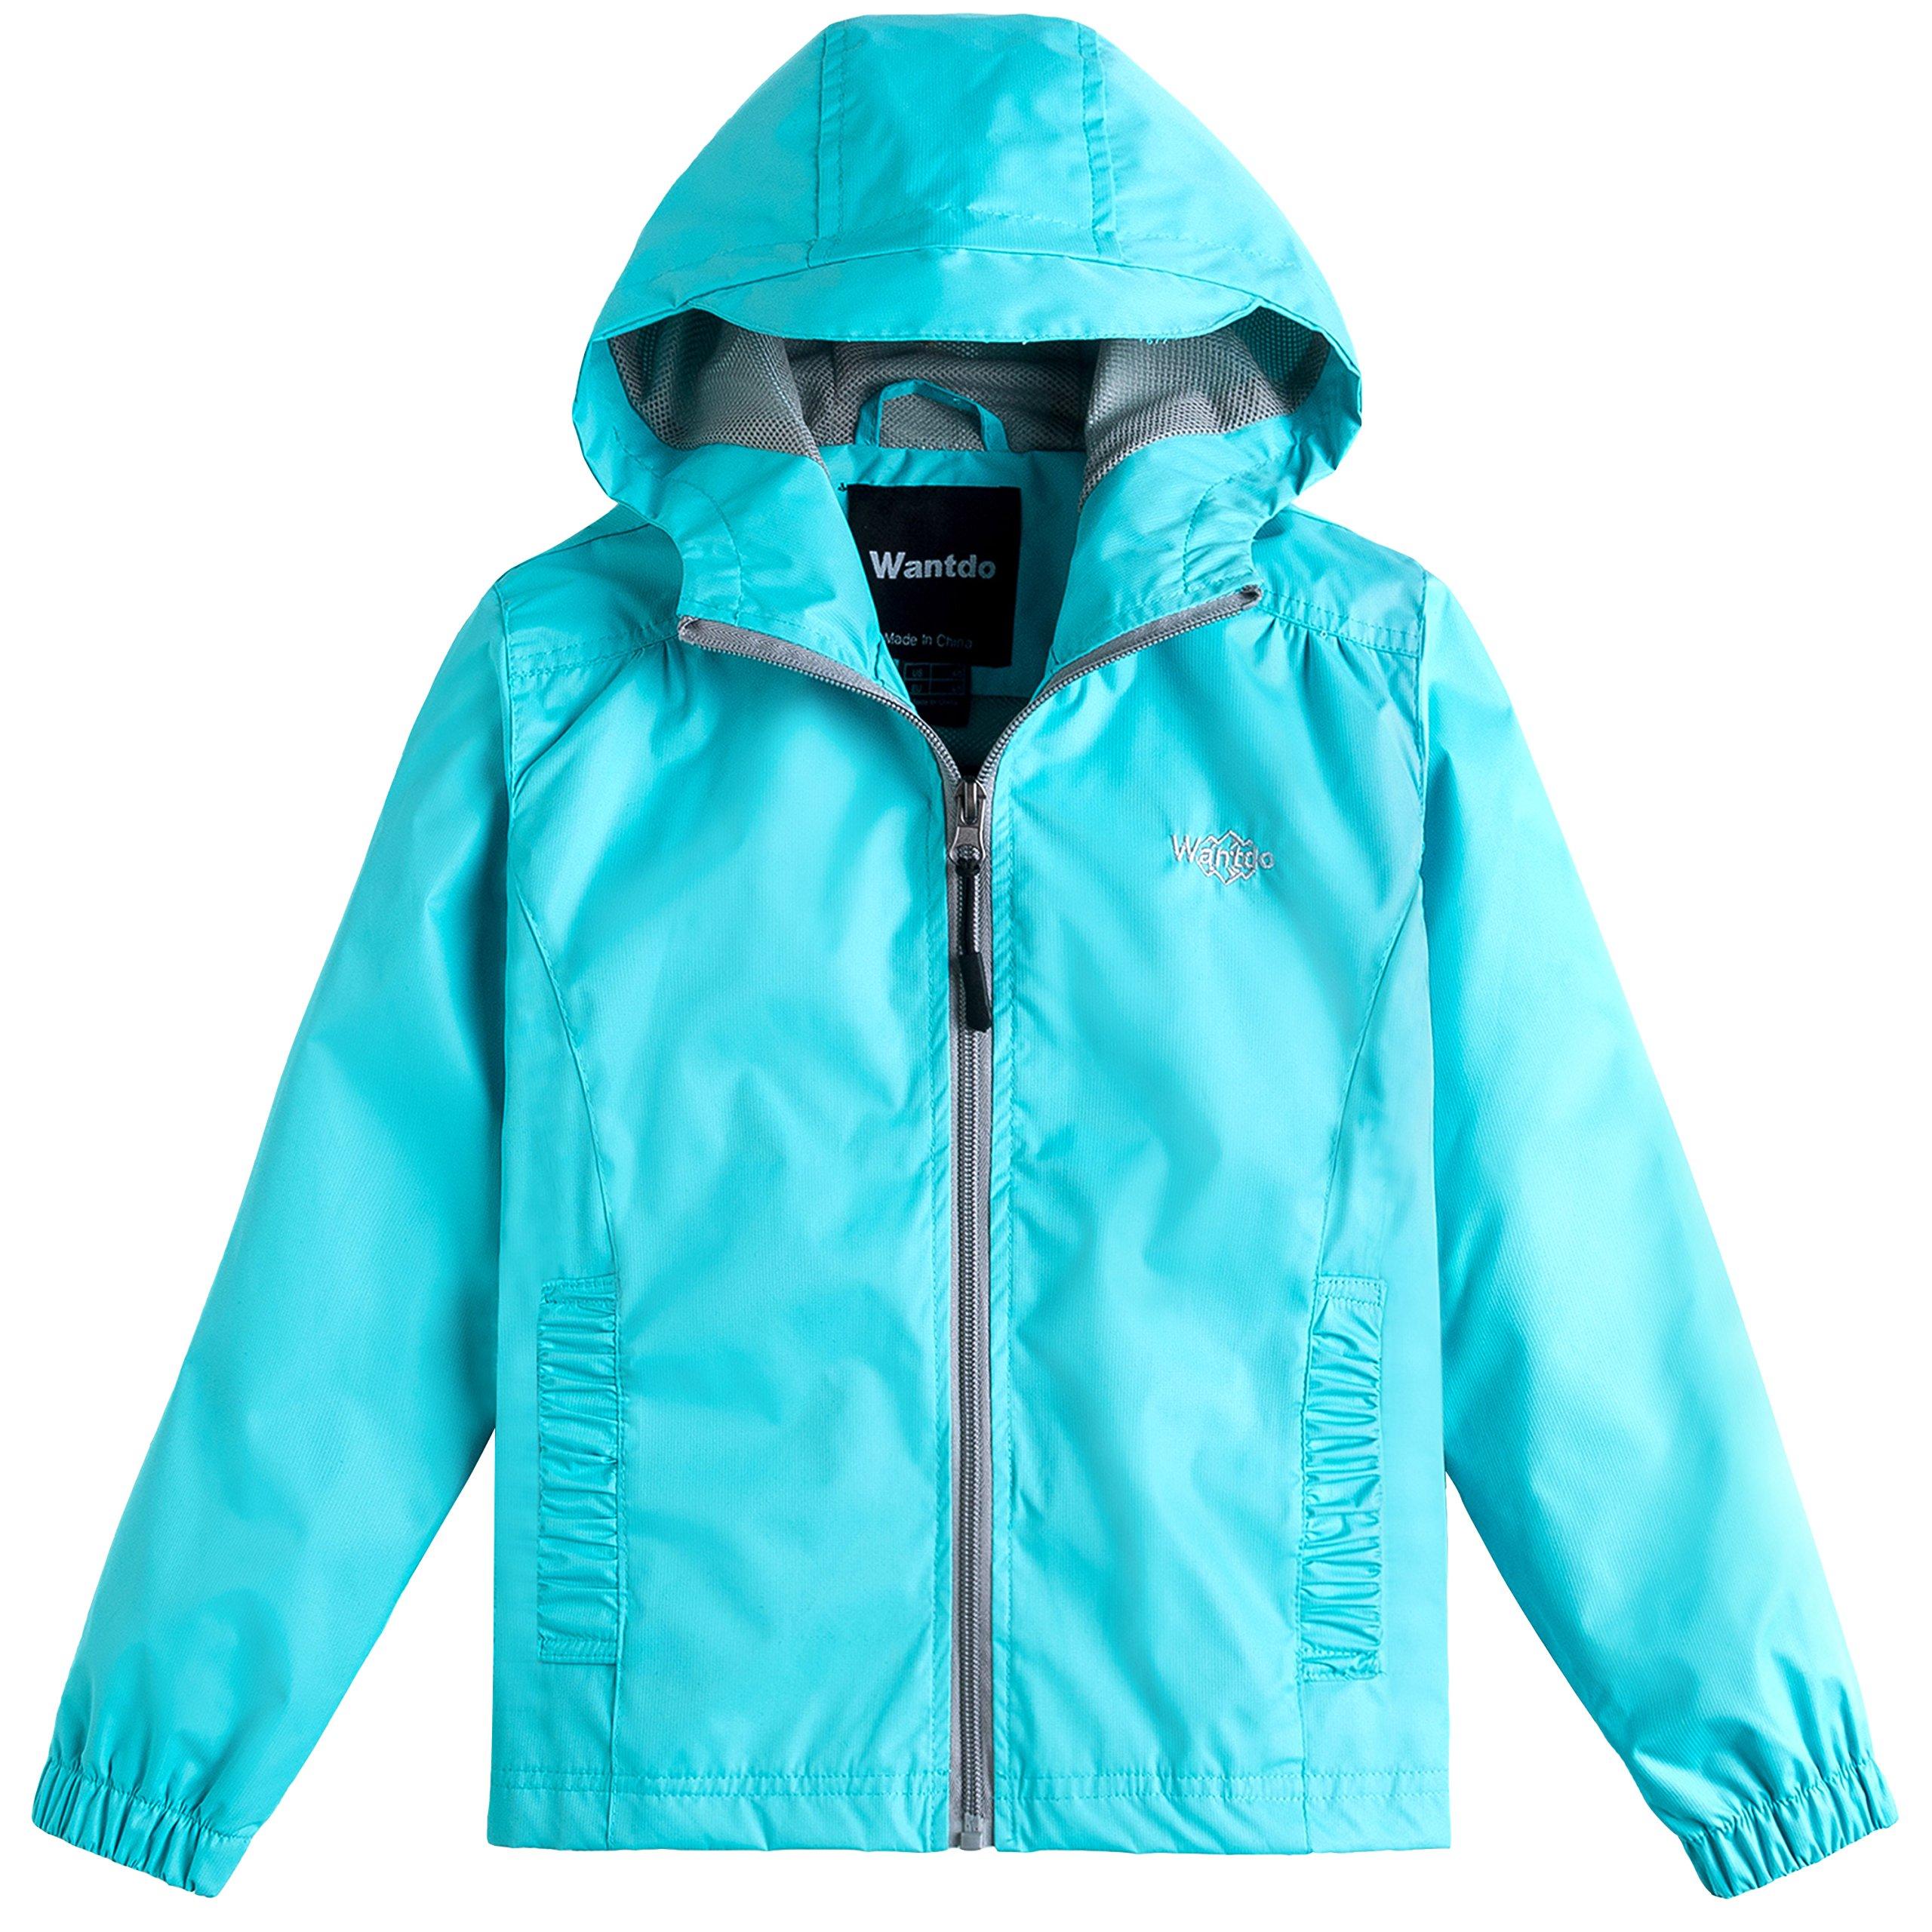 Wantdo Girl's Light Weight Spring Jacket Hooded Windbreaker Mesh Lined Rain Wear for Camping(Light Blue, 4/5)